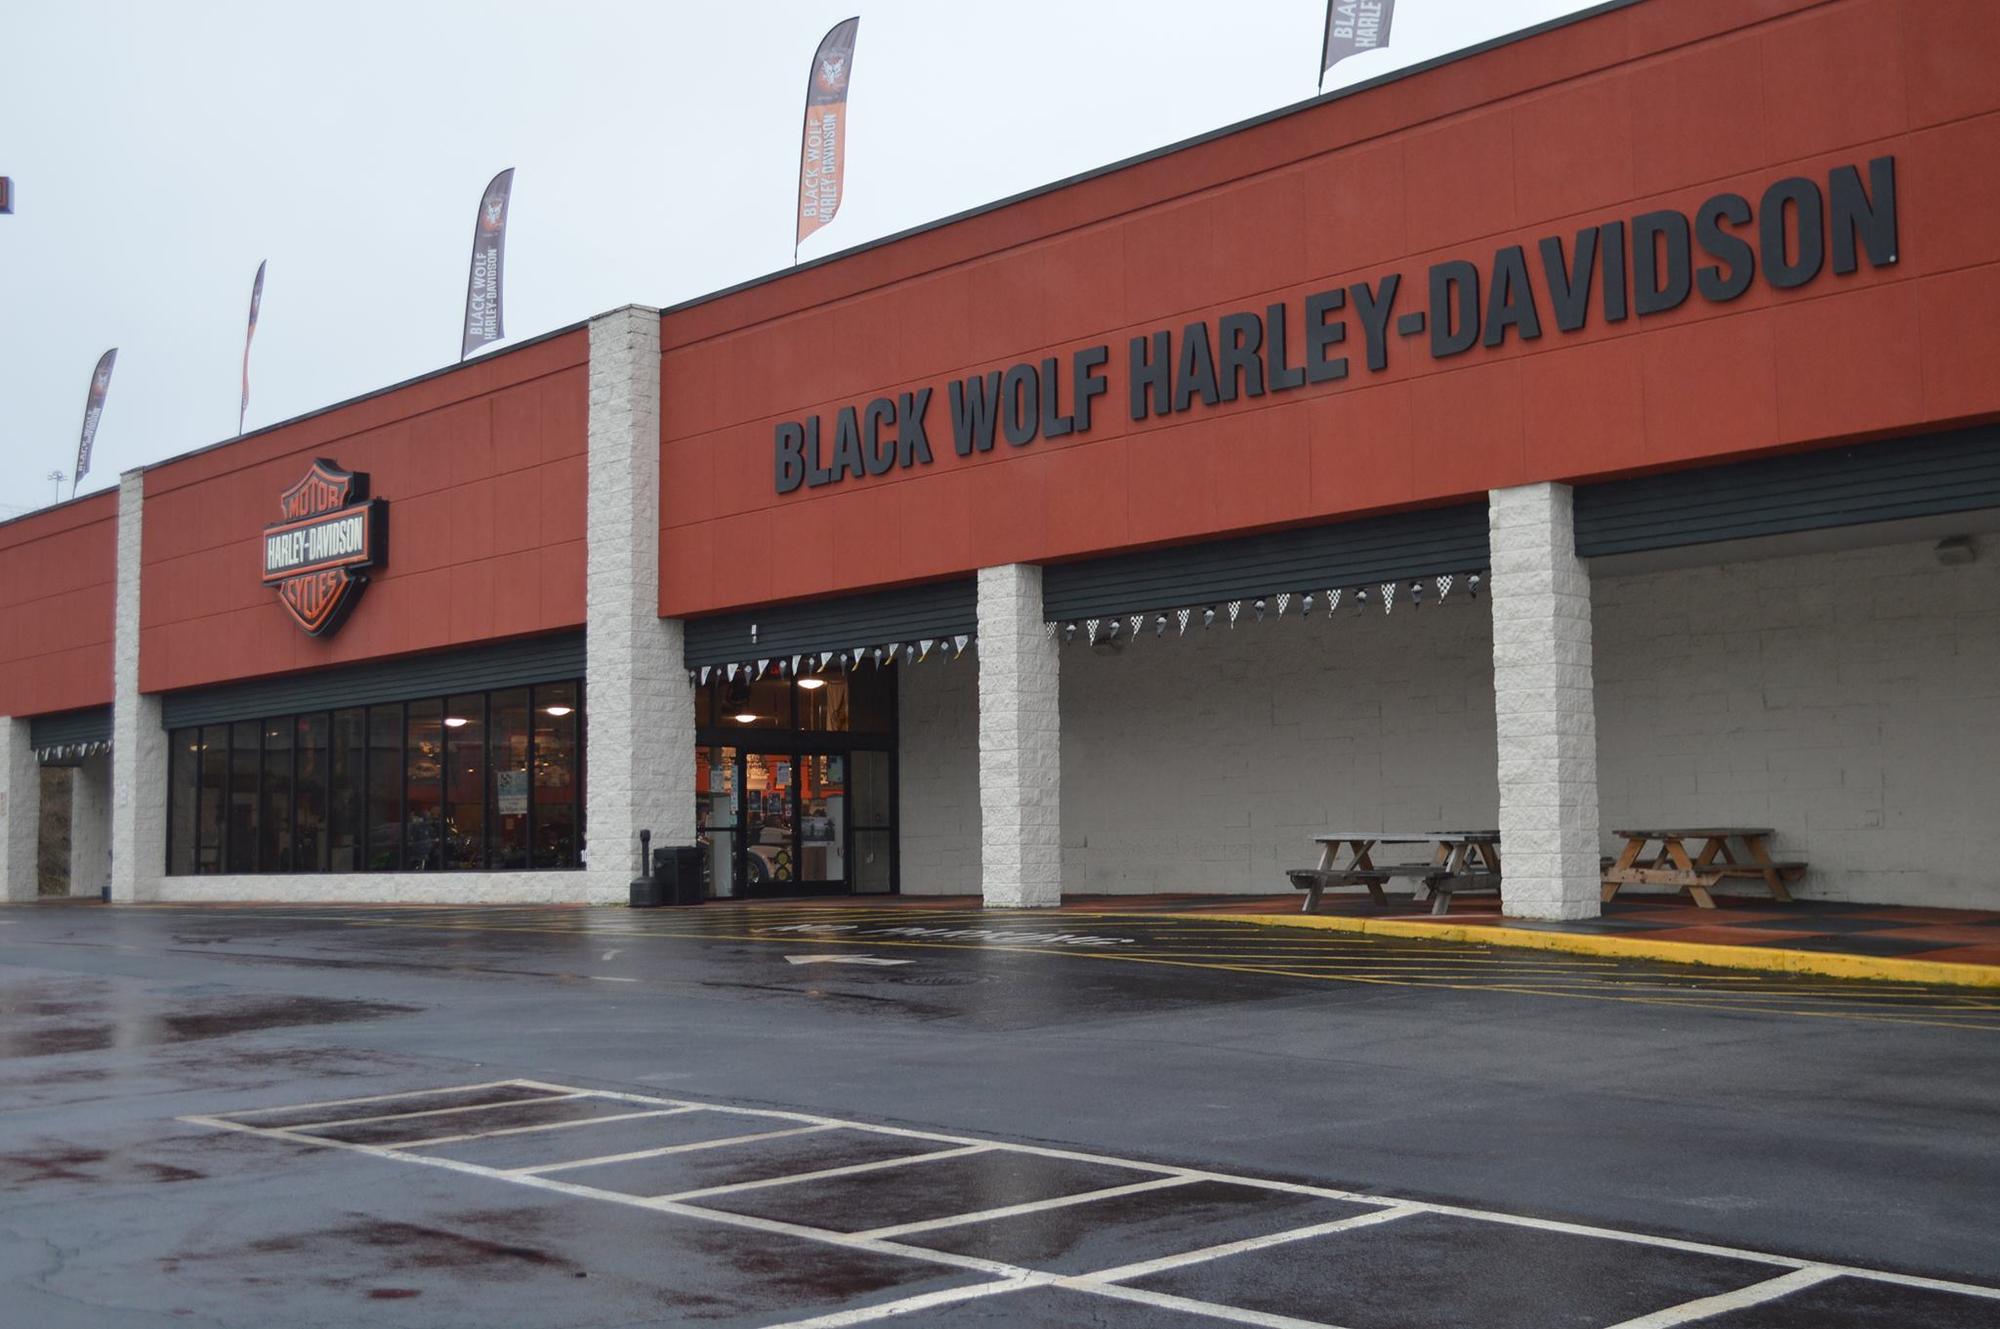 black wolf harley-davidson's birthday bash vip party tickets in